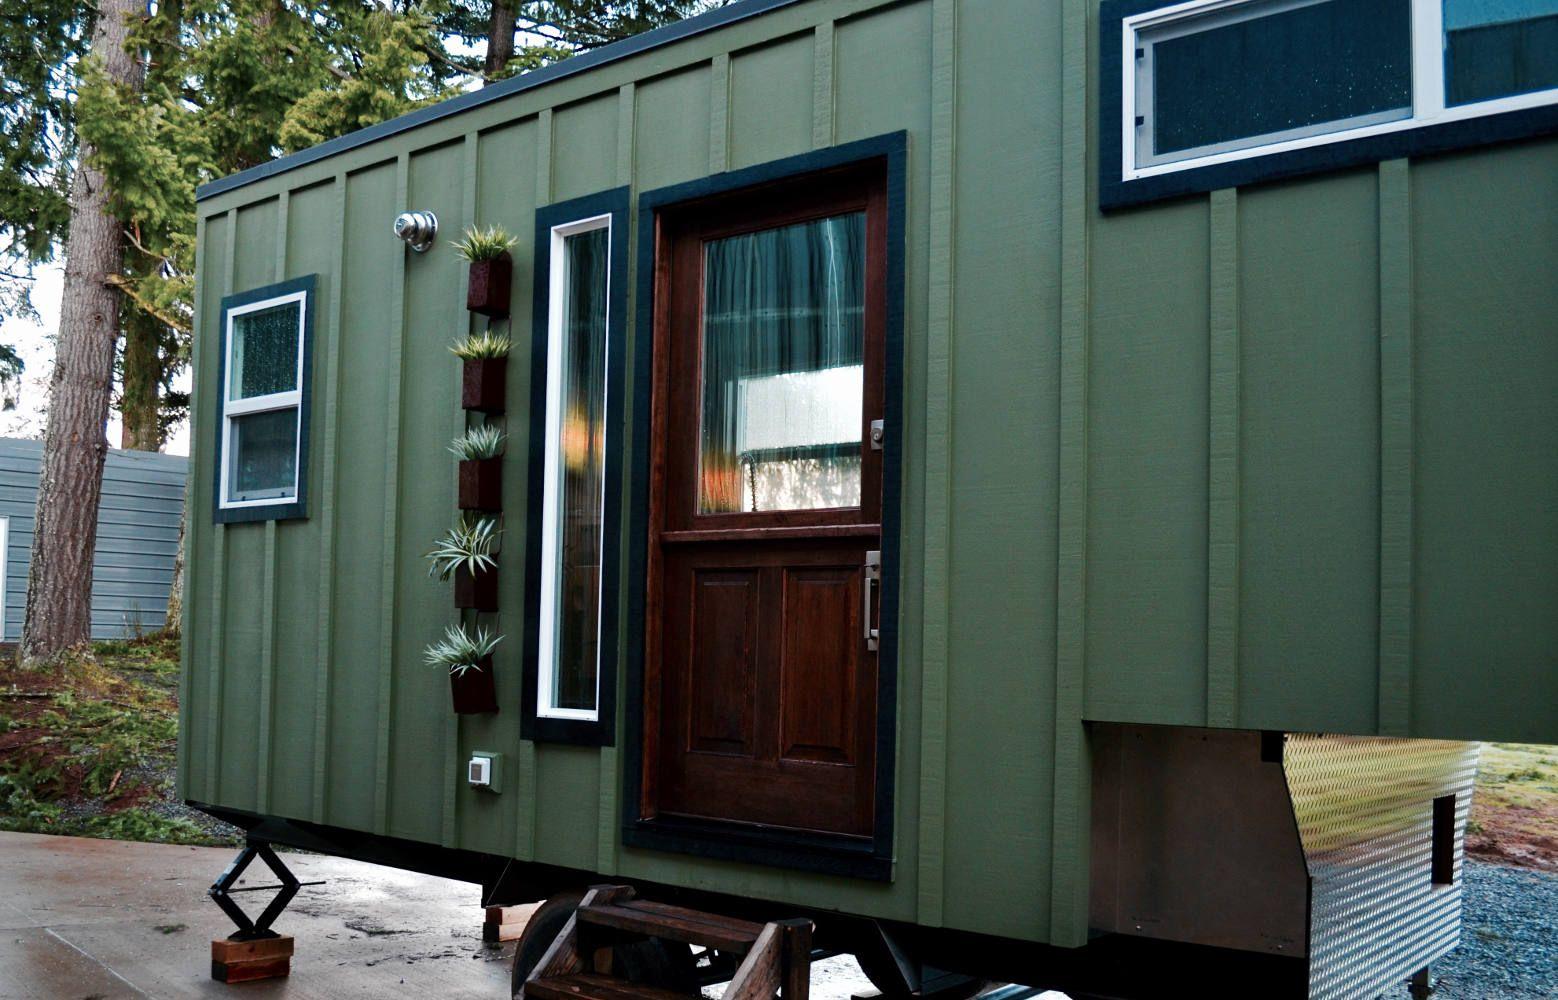 A tiny house on wheels designed by Tiny Heirloom of Portland, Oregon.